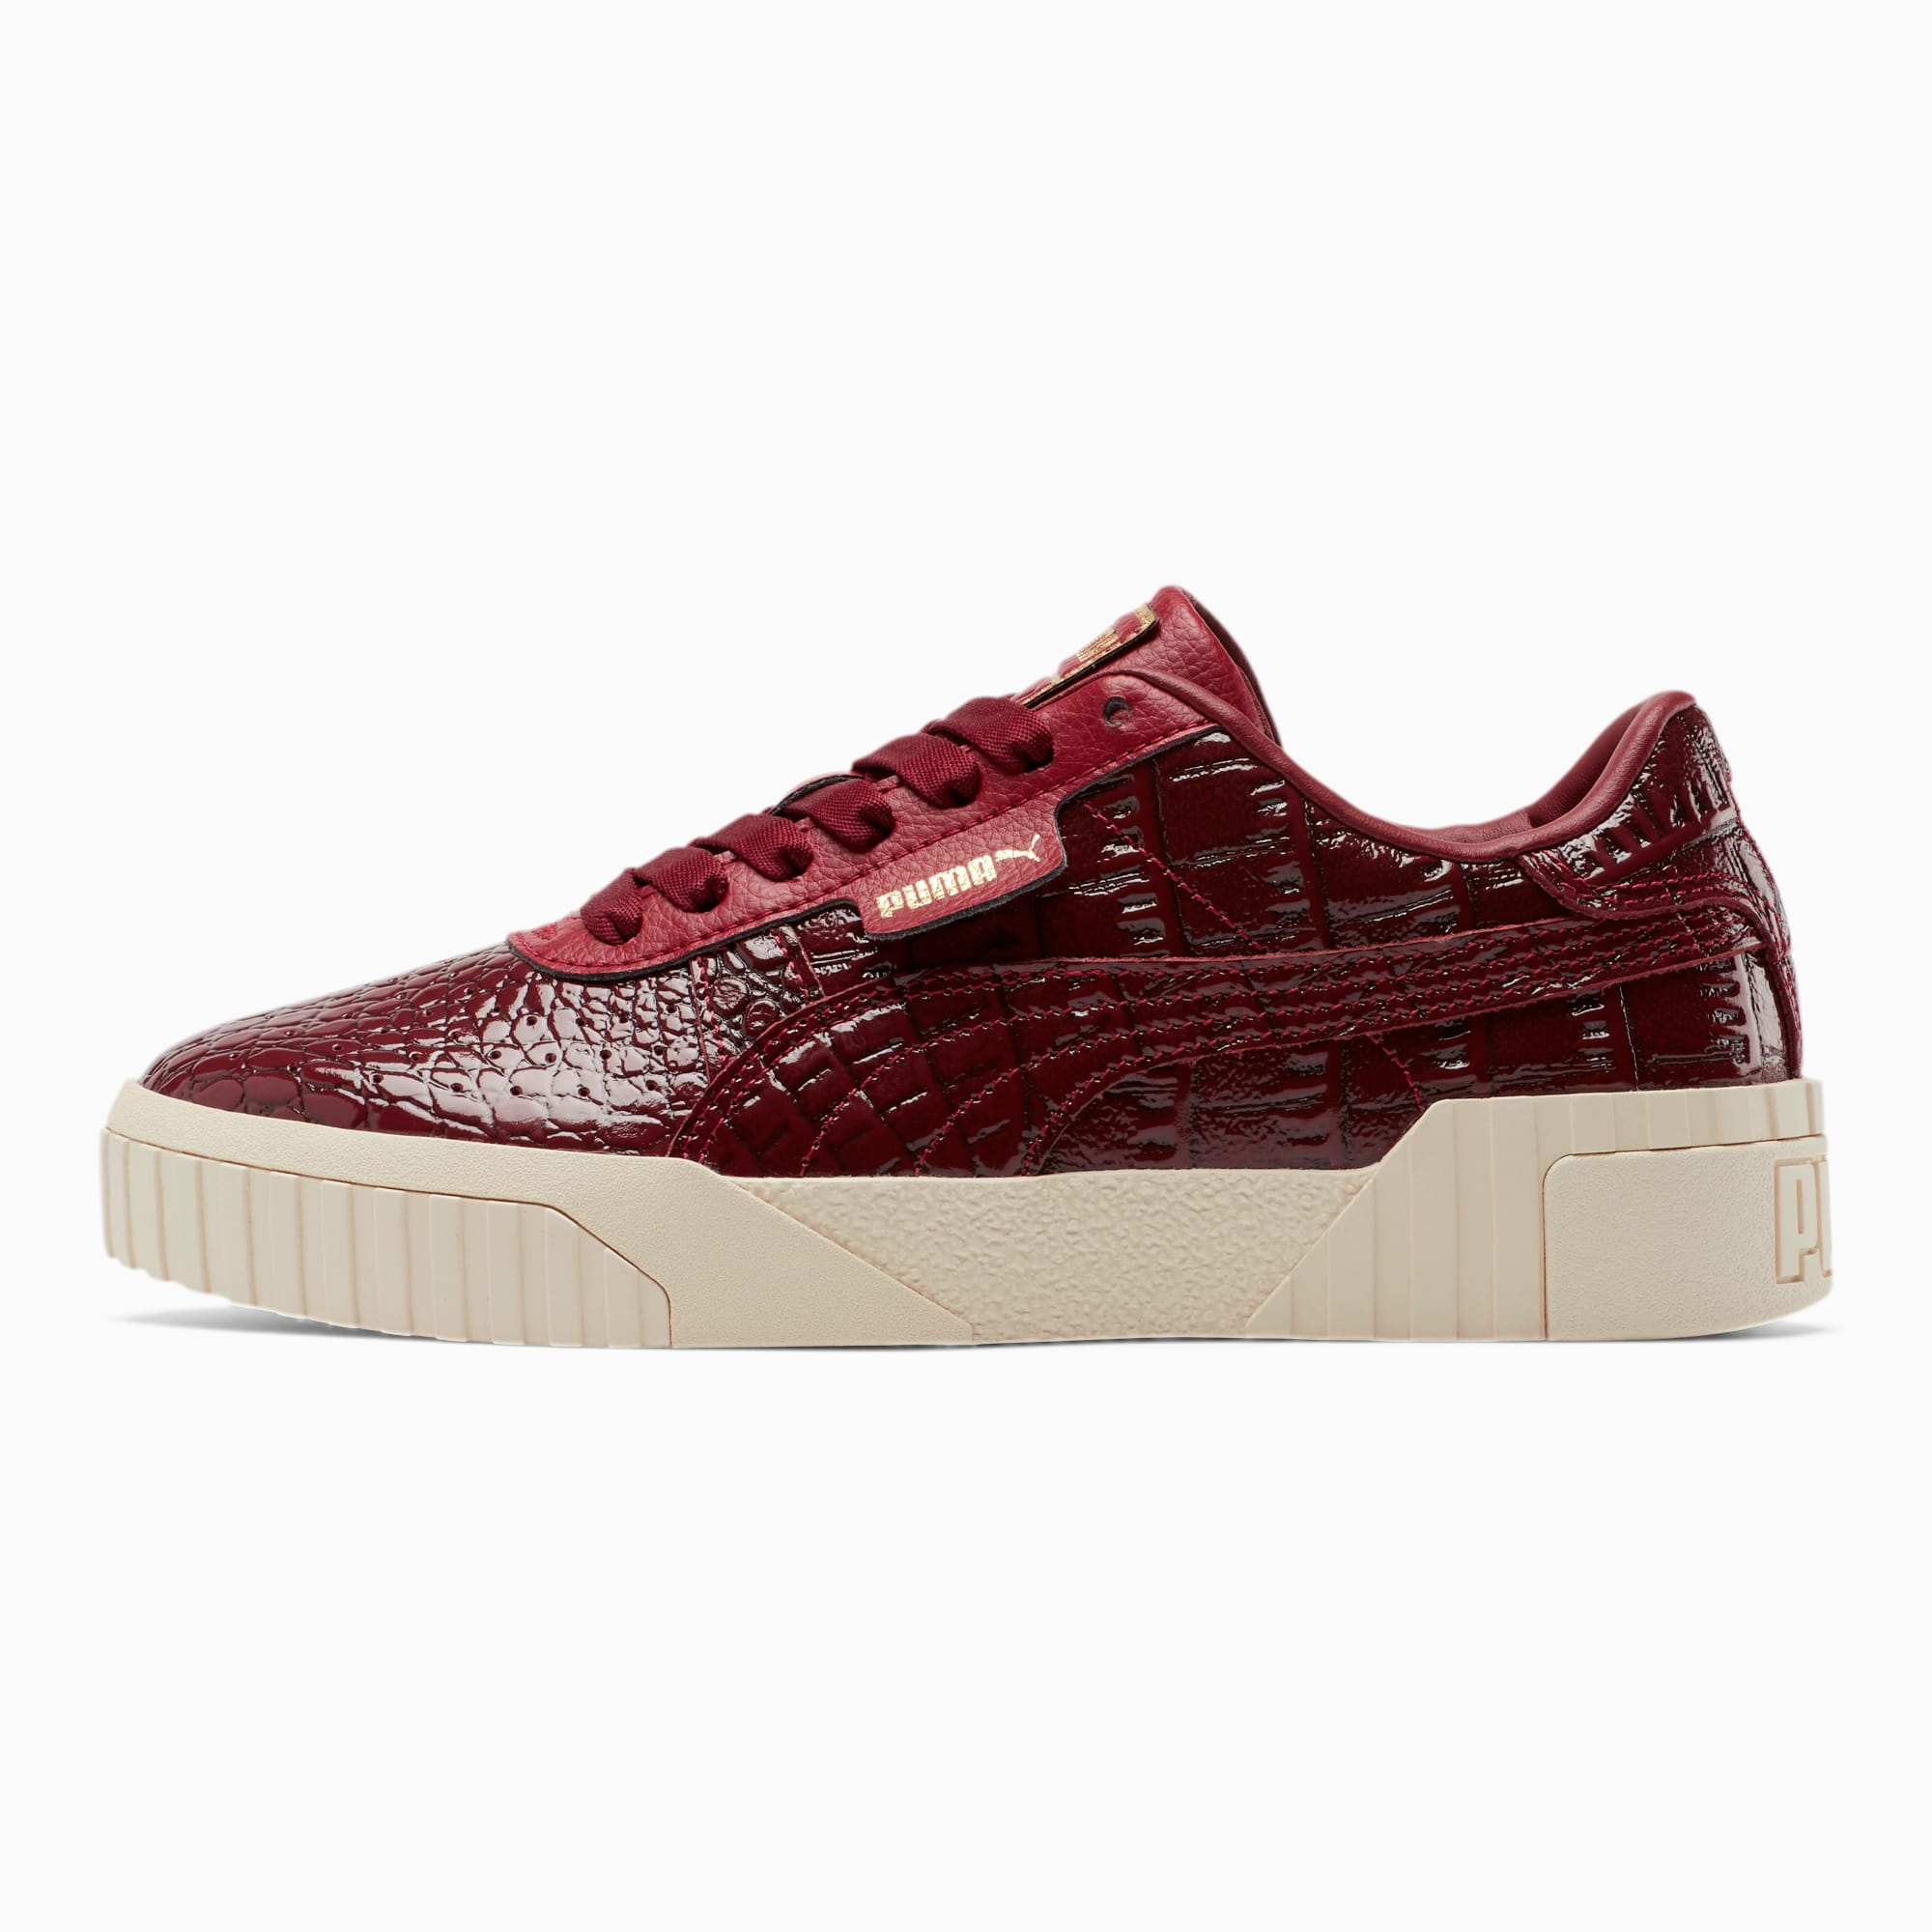 Cali Croc Women's Sneakers